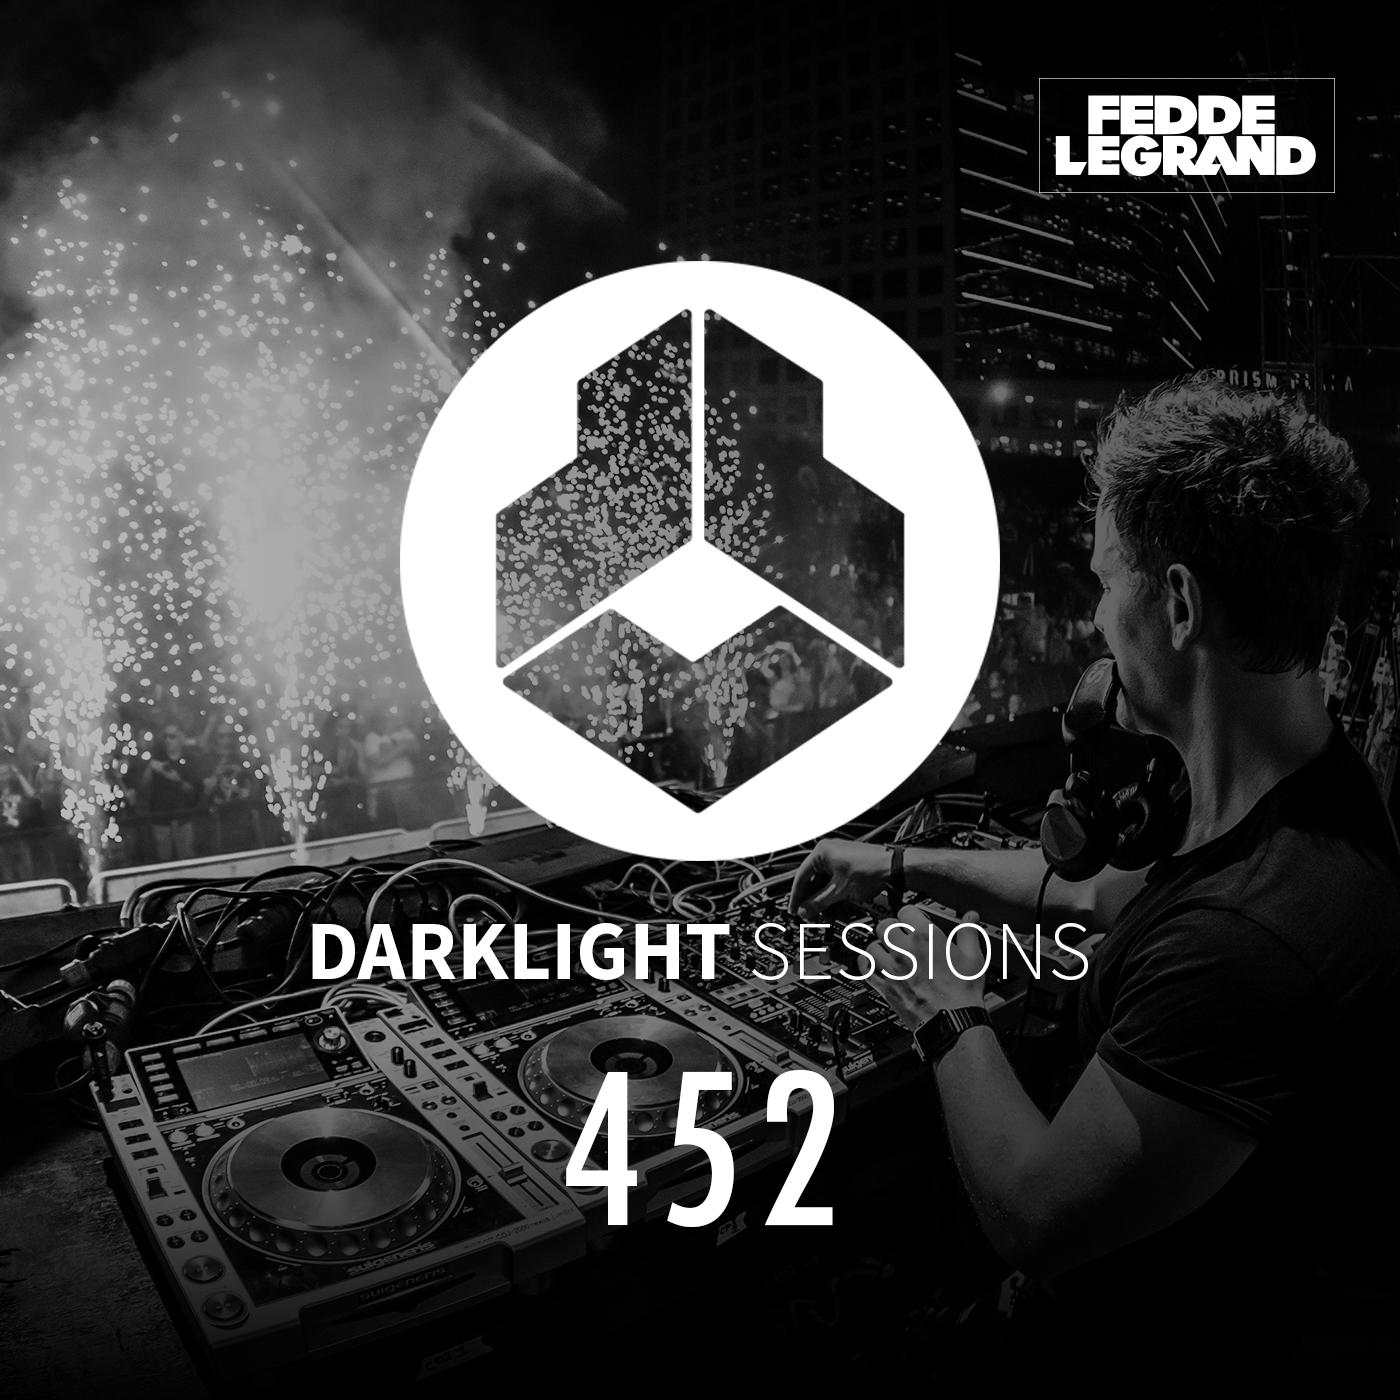 Darklight Sessions 452